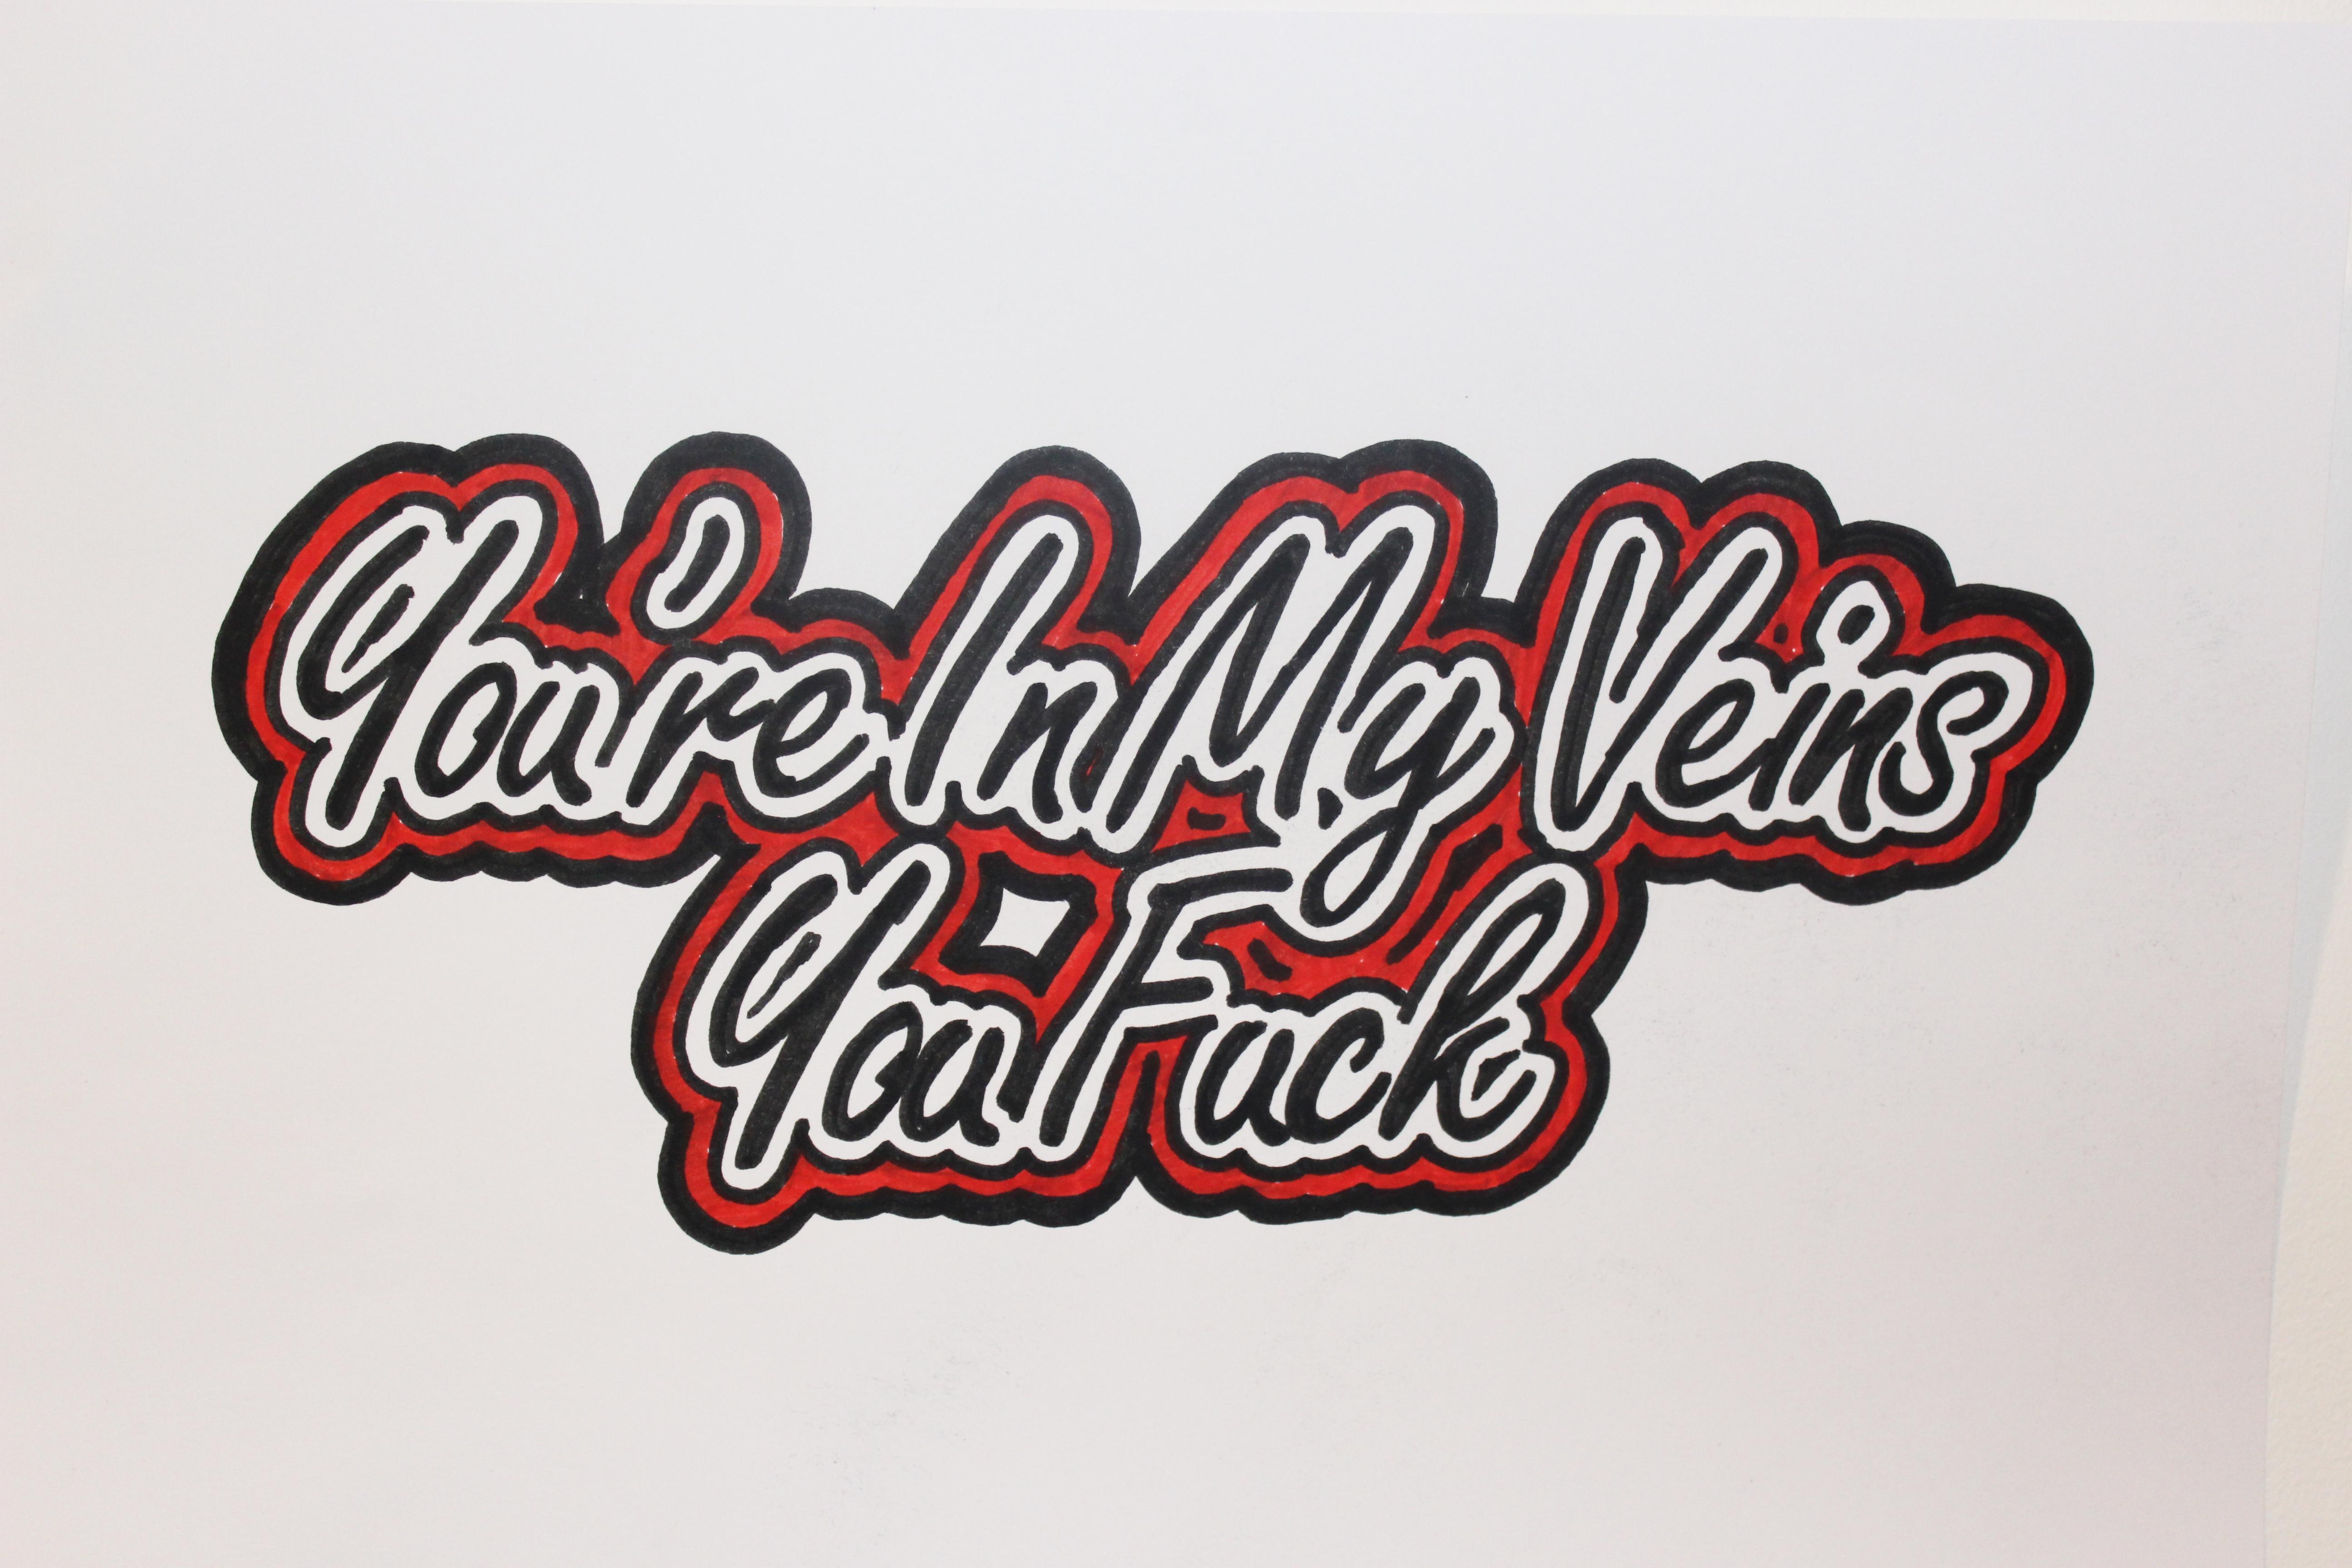 In My Veins Original paper emerging artist red black pen pop signed eyal booker